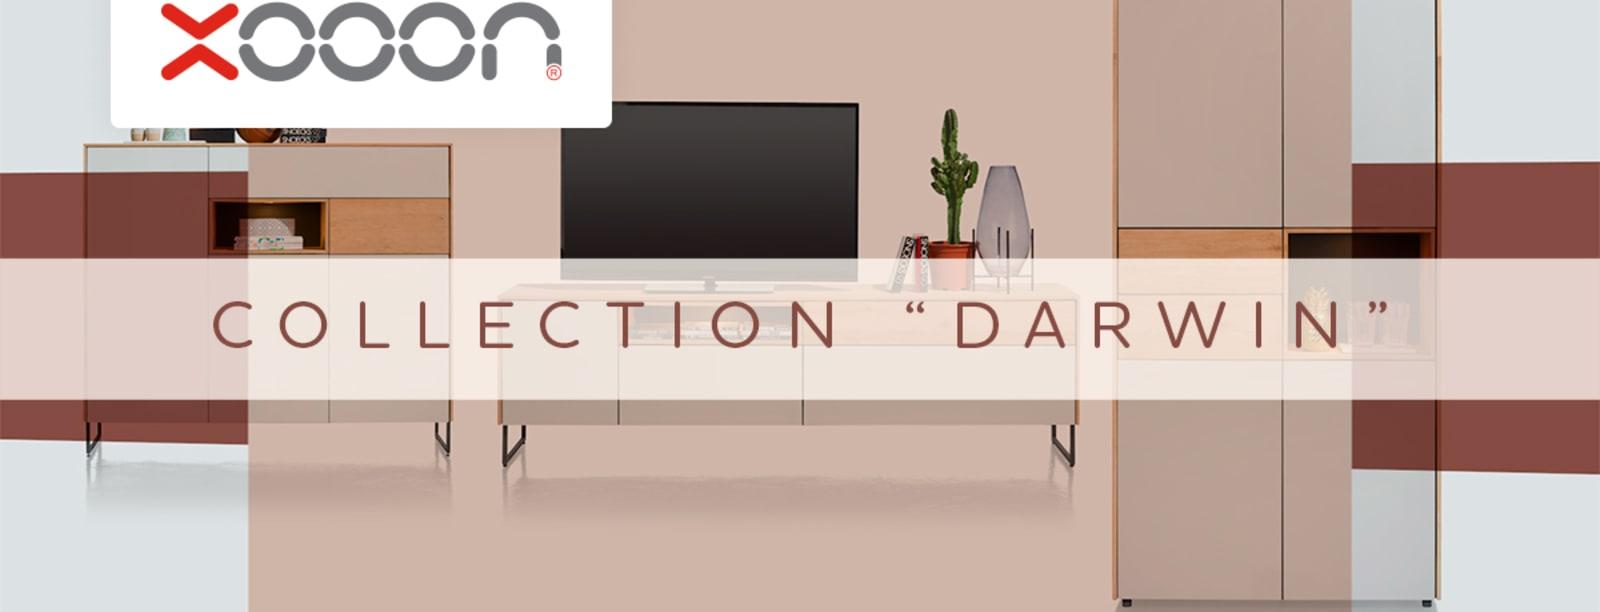 "Meubles minimalistes de la collection ""DARWIN"""